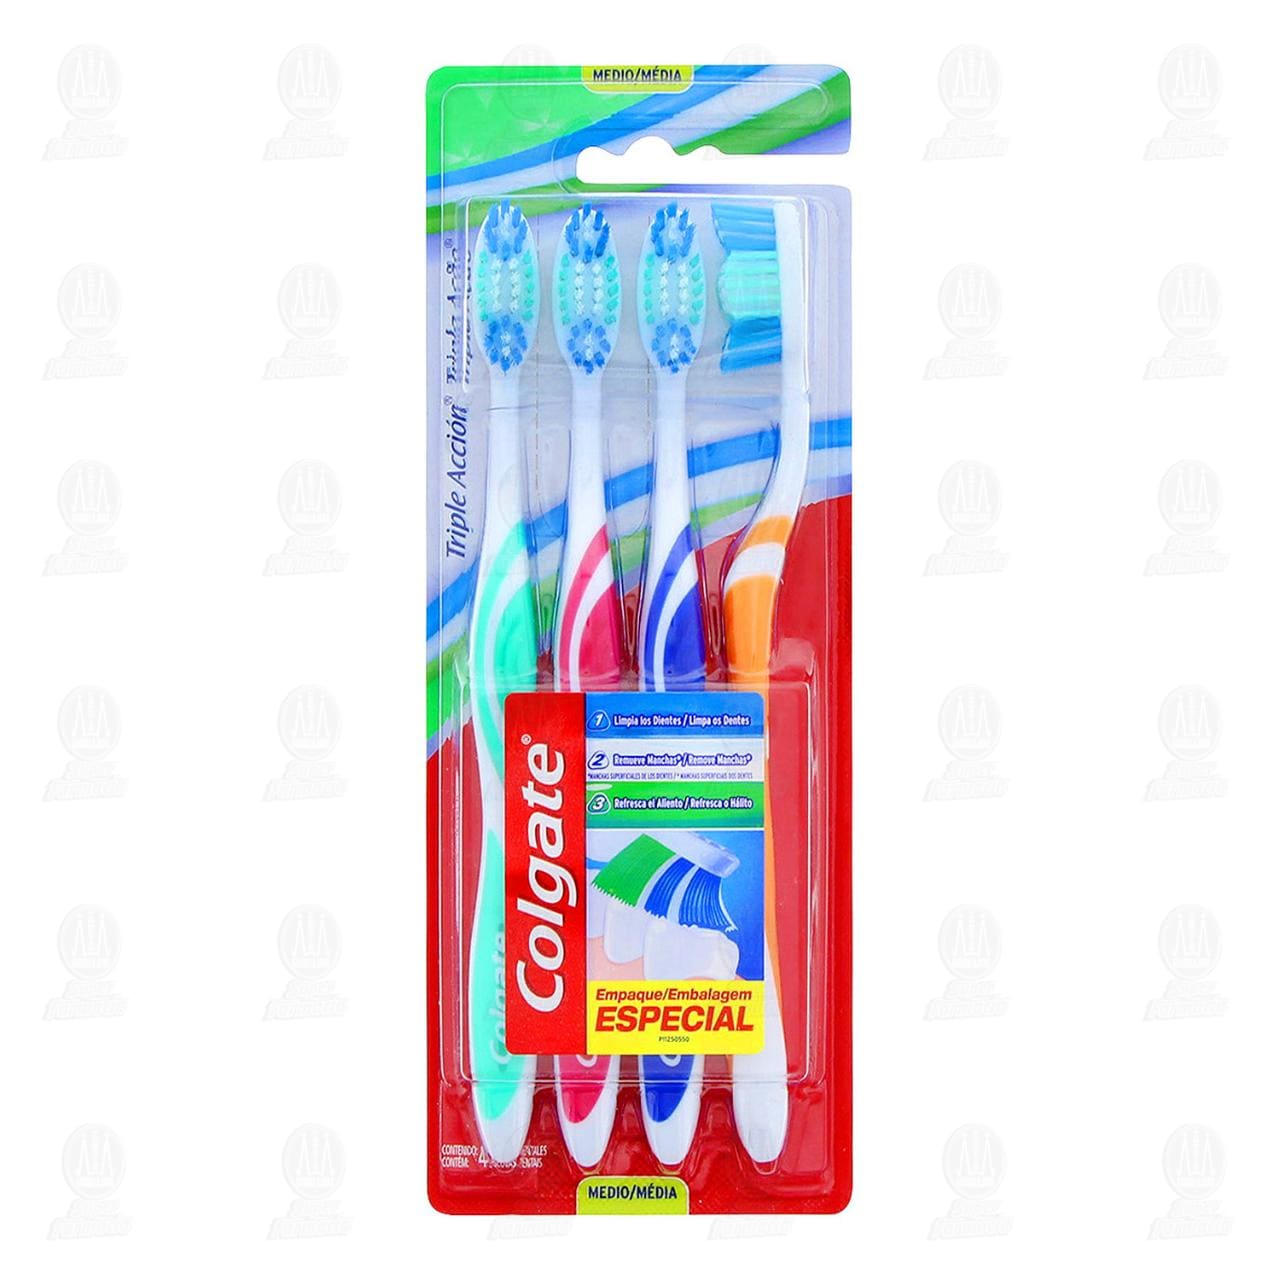 Cepillo dental Colgate Triple Acción 4, pzas.